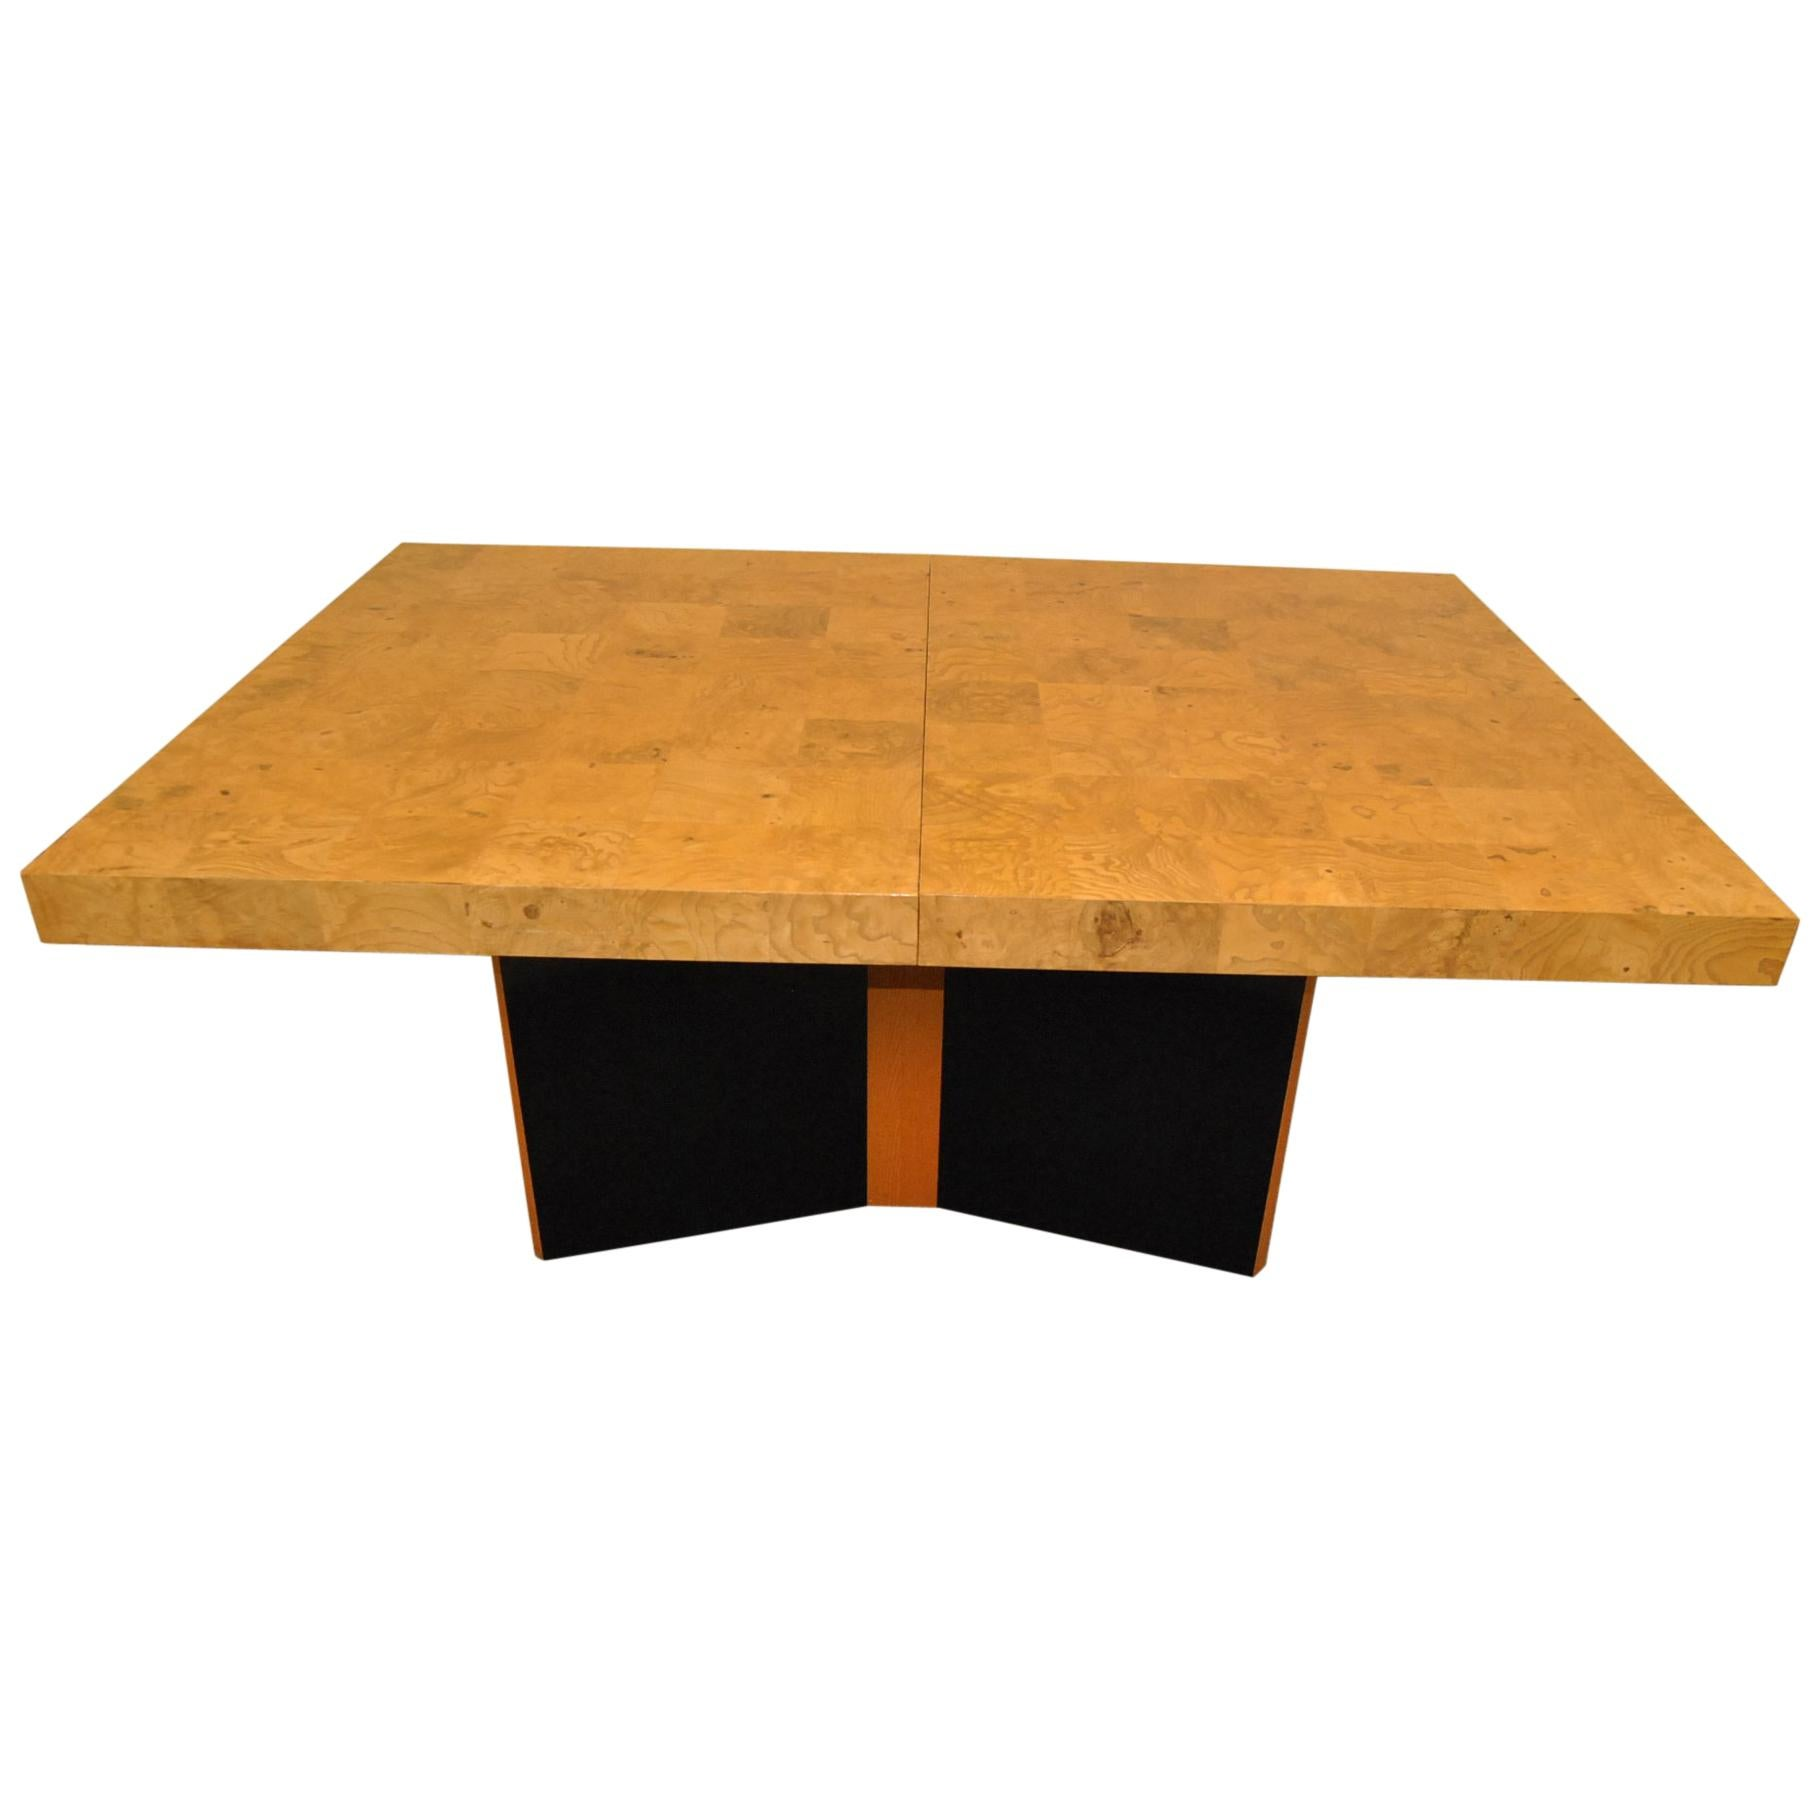 Thayer Coggin Olive Wood Dining Room Table Milo Baughman Design